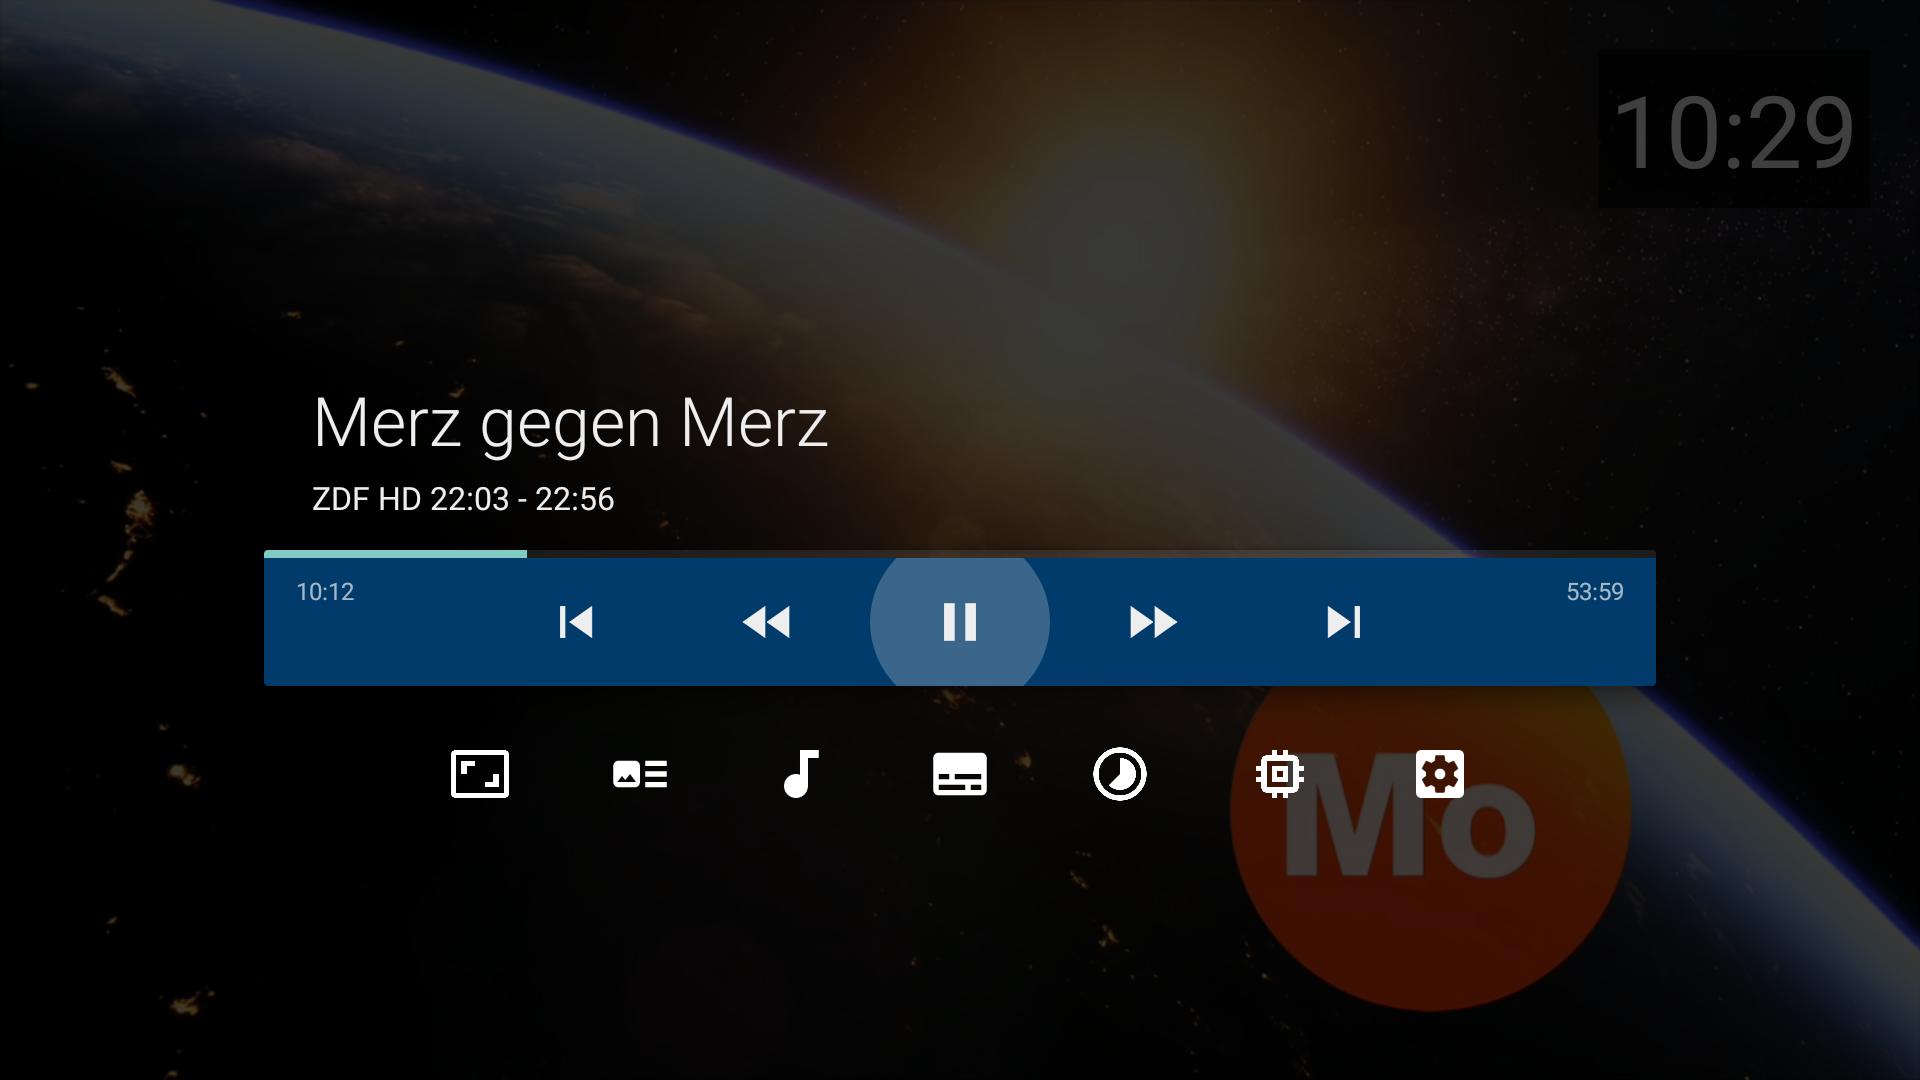 Fritz Tv App Auf Fire Tv